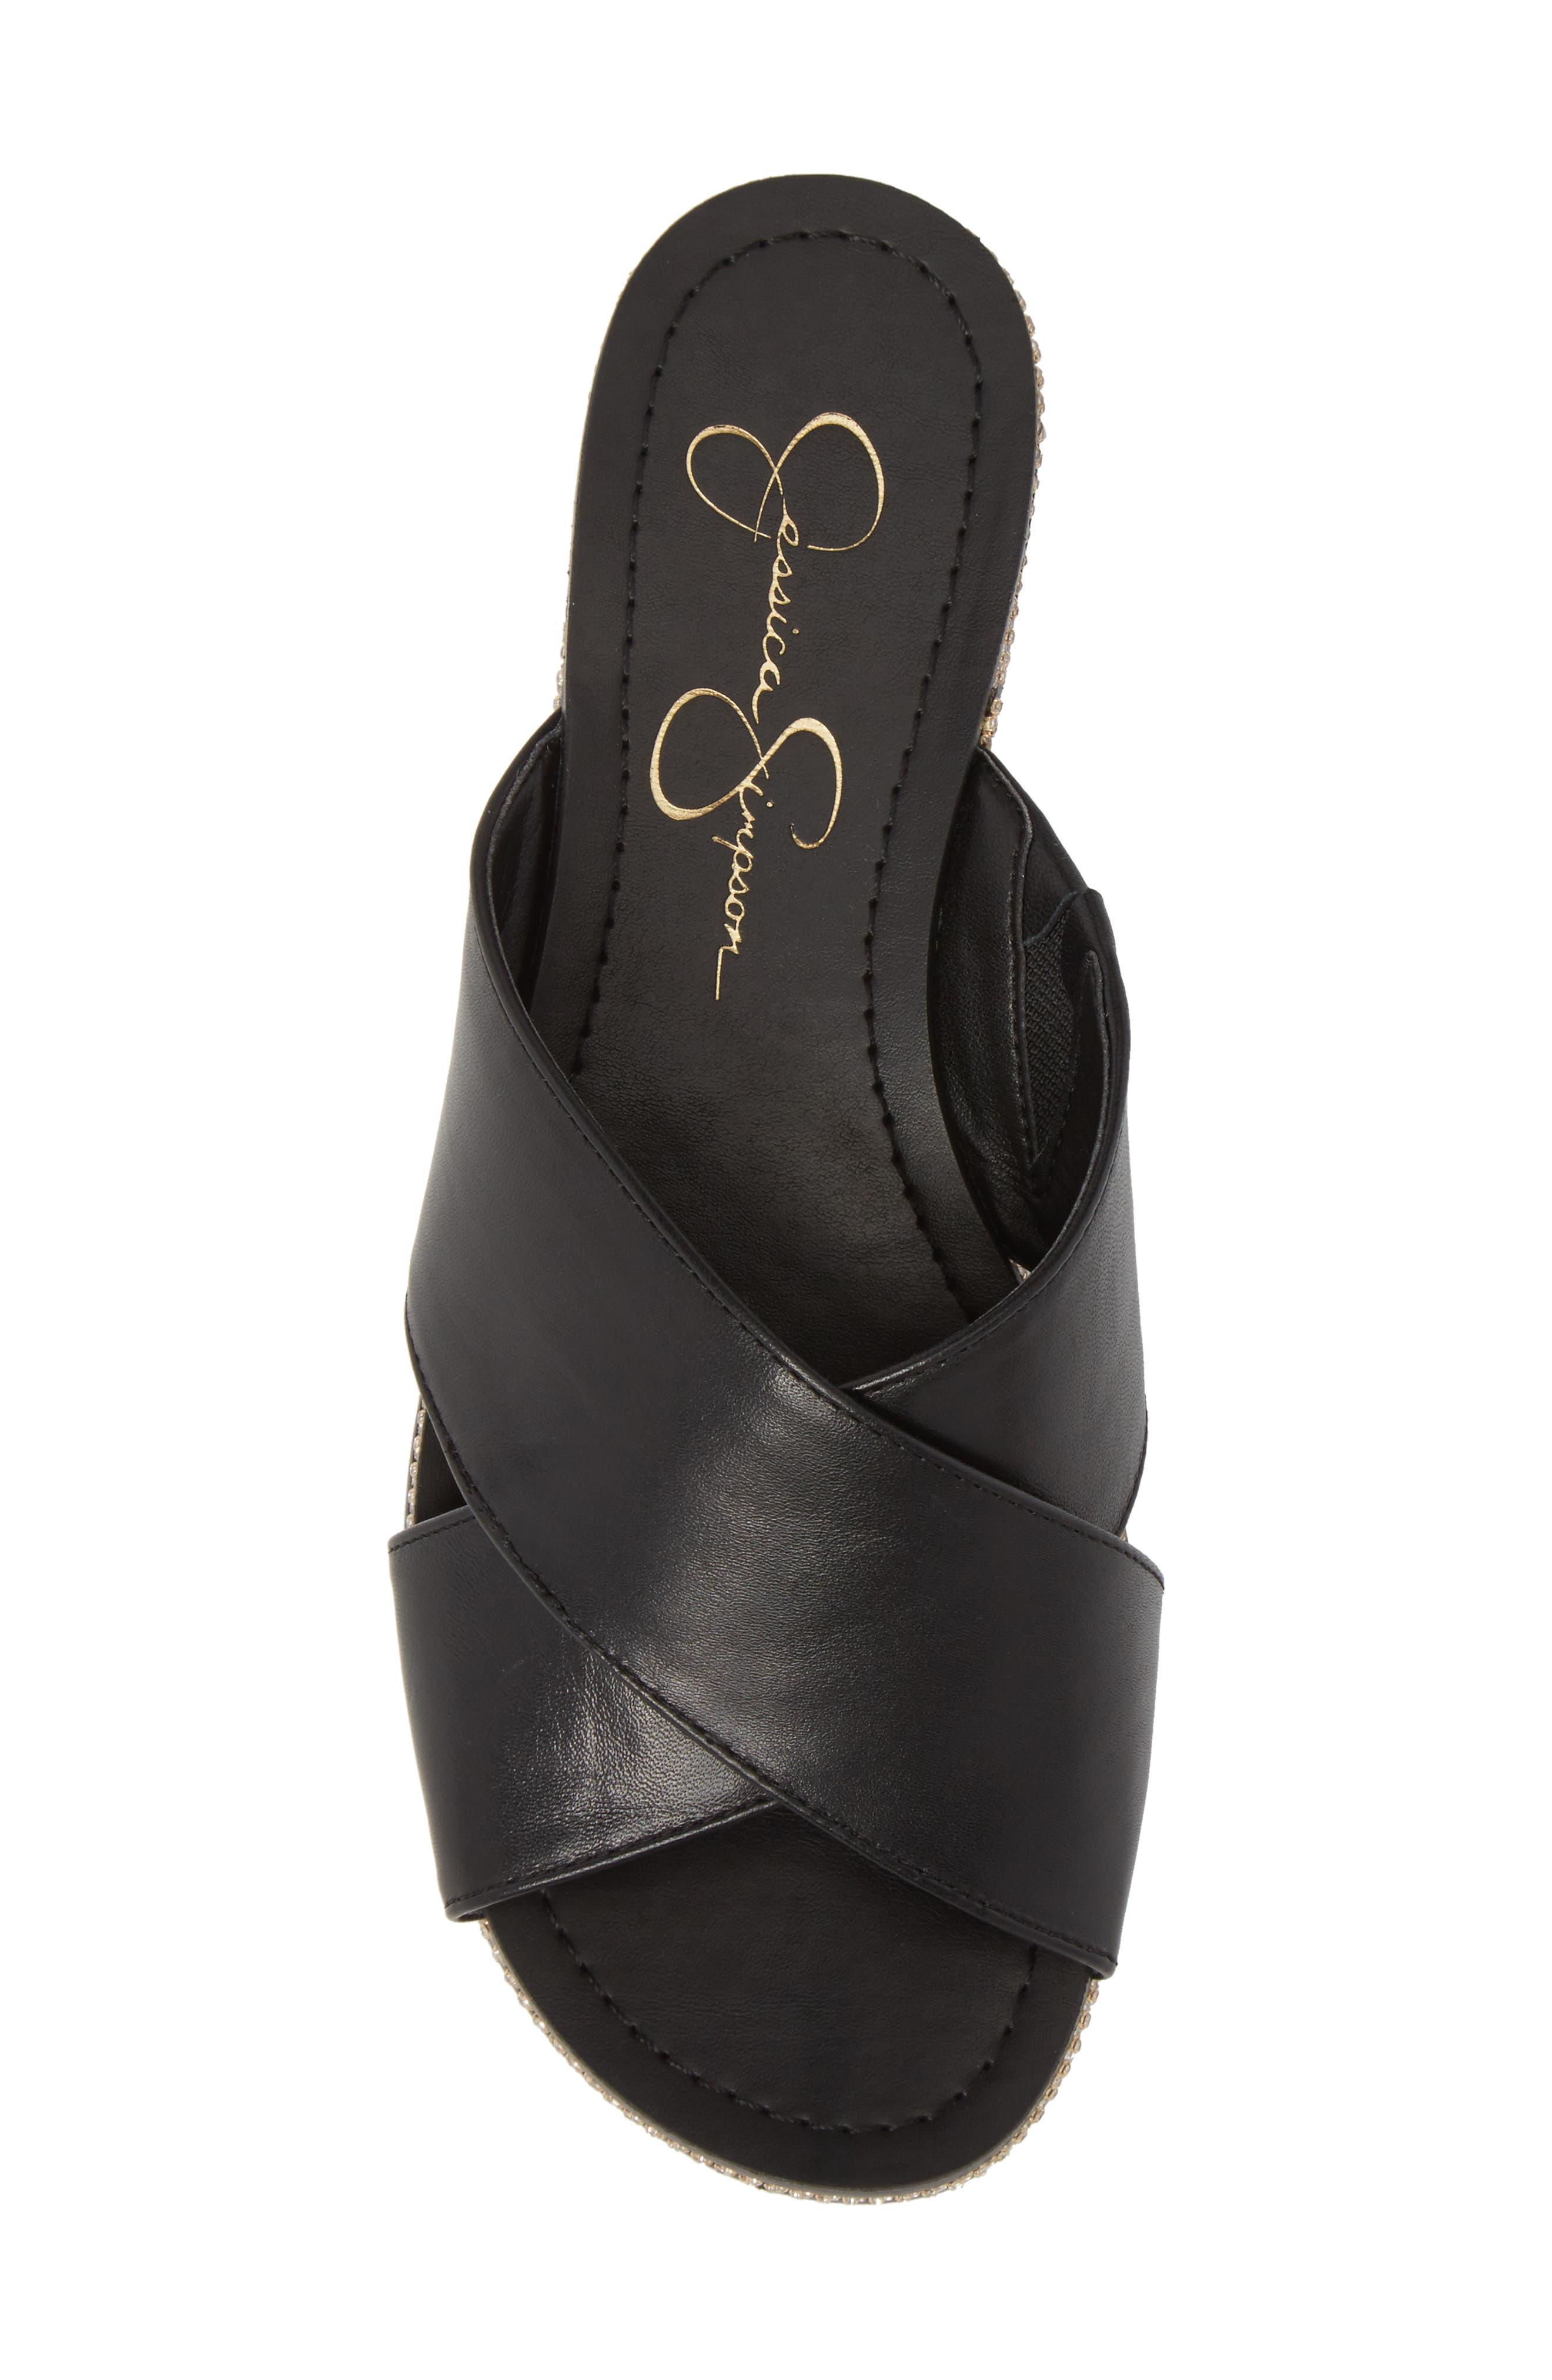 Brinella Sandal,                             Alternate thumbnail 5, color,                             Black